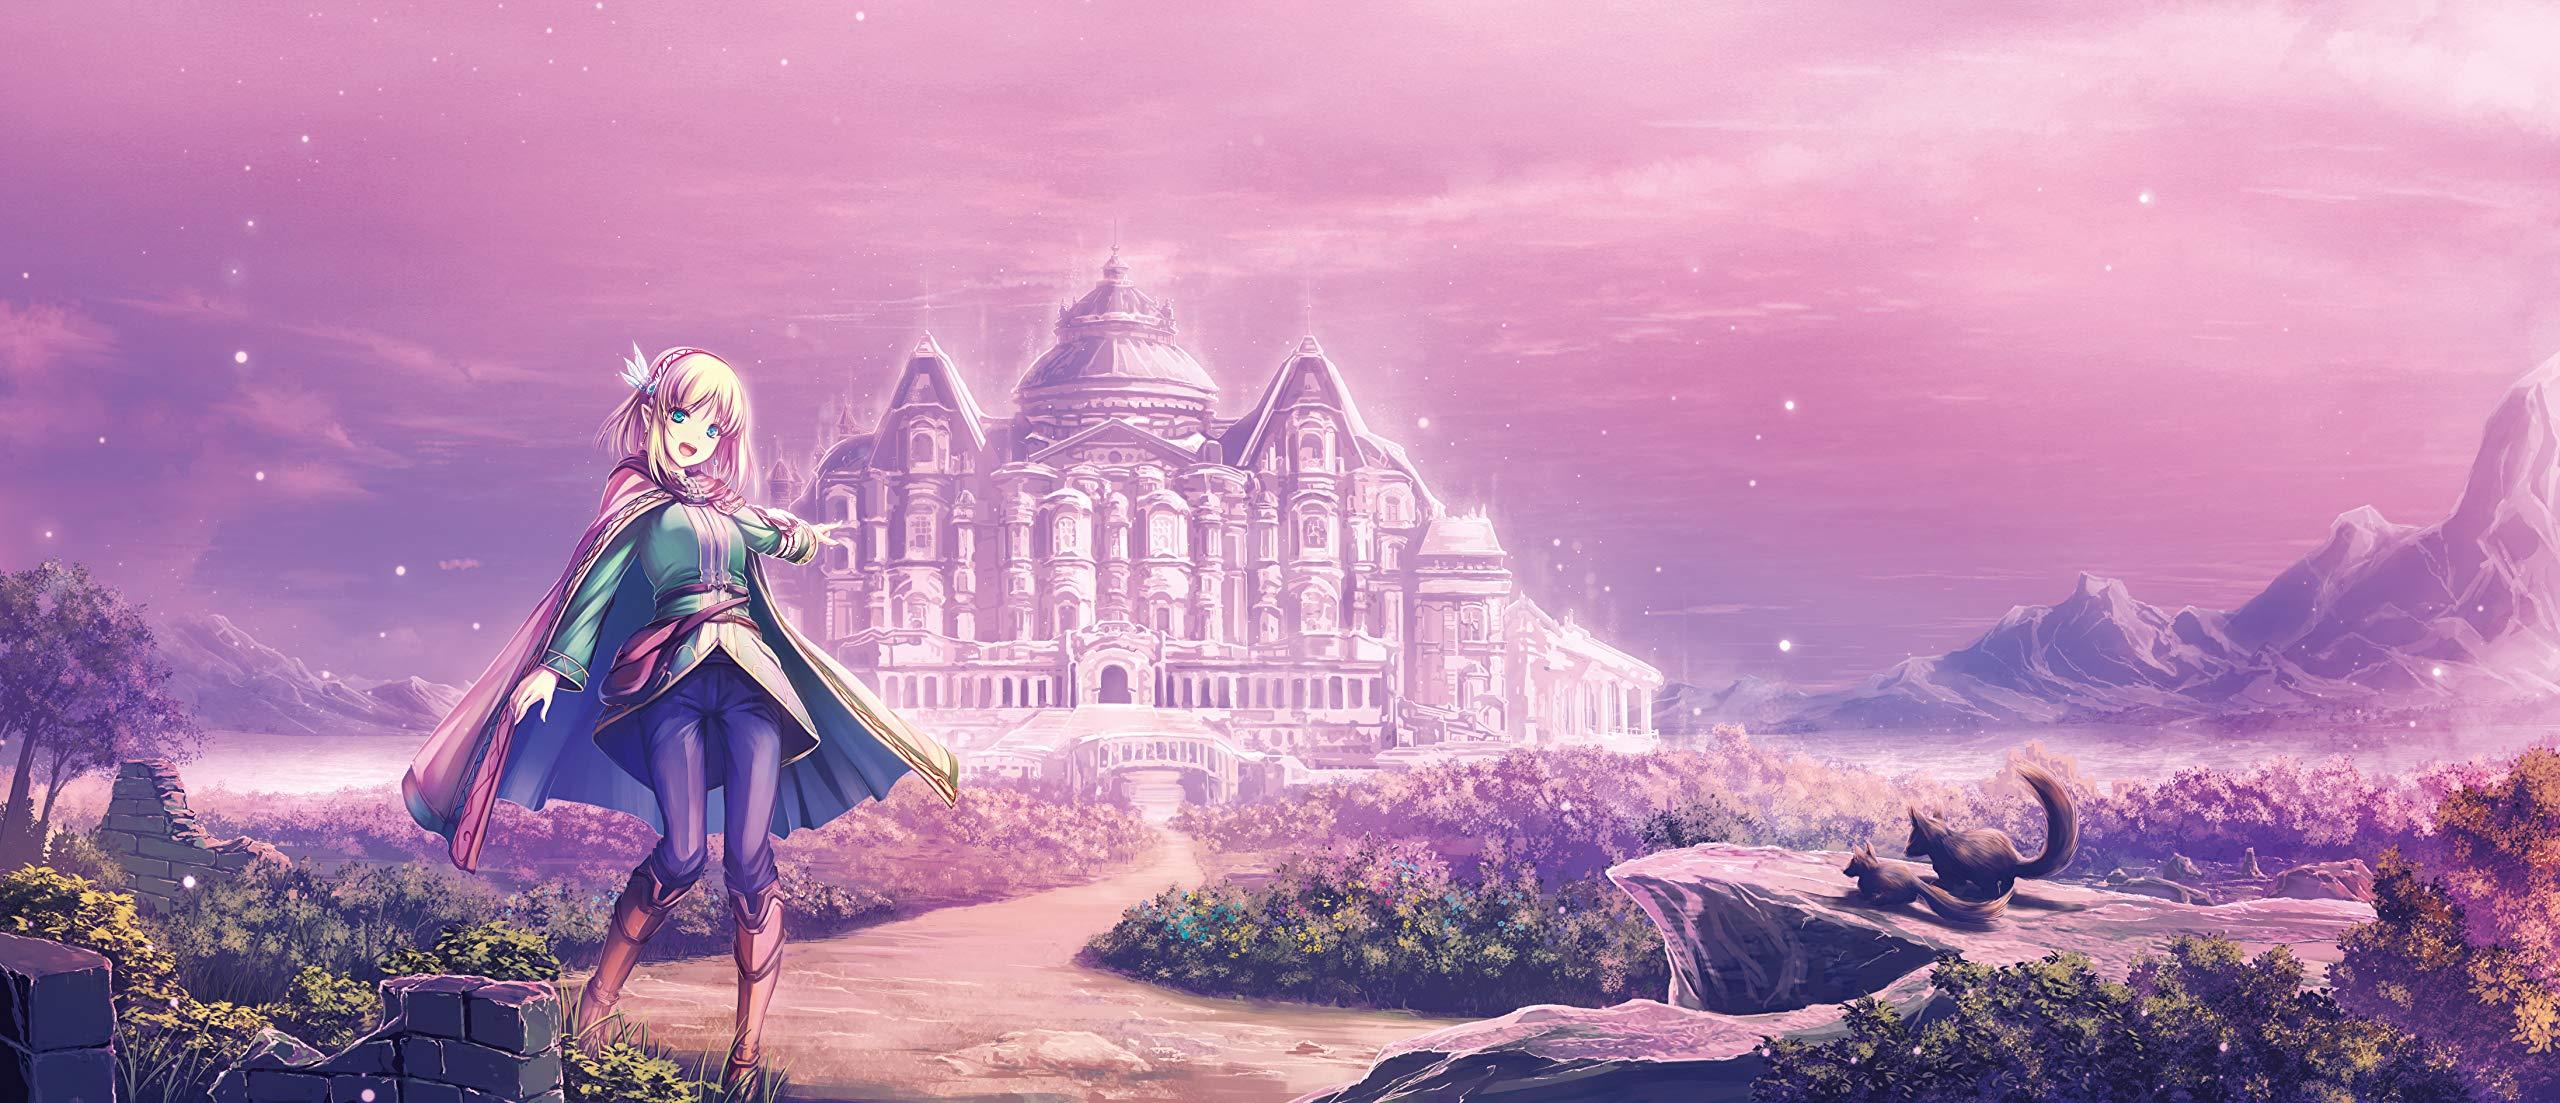 Anime 2560x1103 Leadale no Daichi nite Light Novel castle blossoms animals open mouth landscape anime